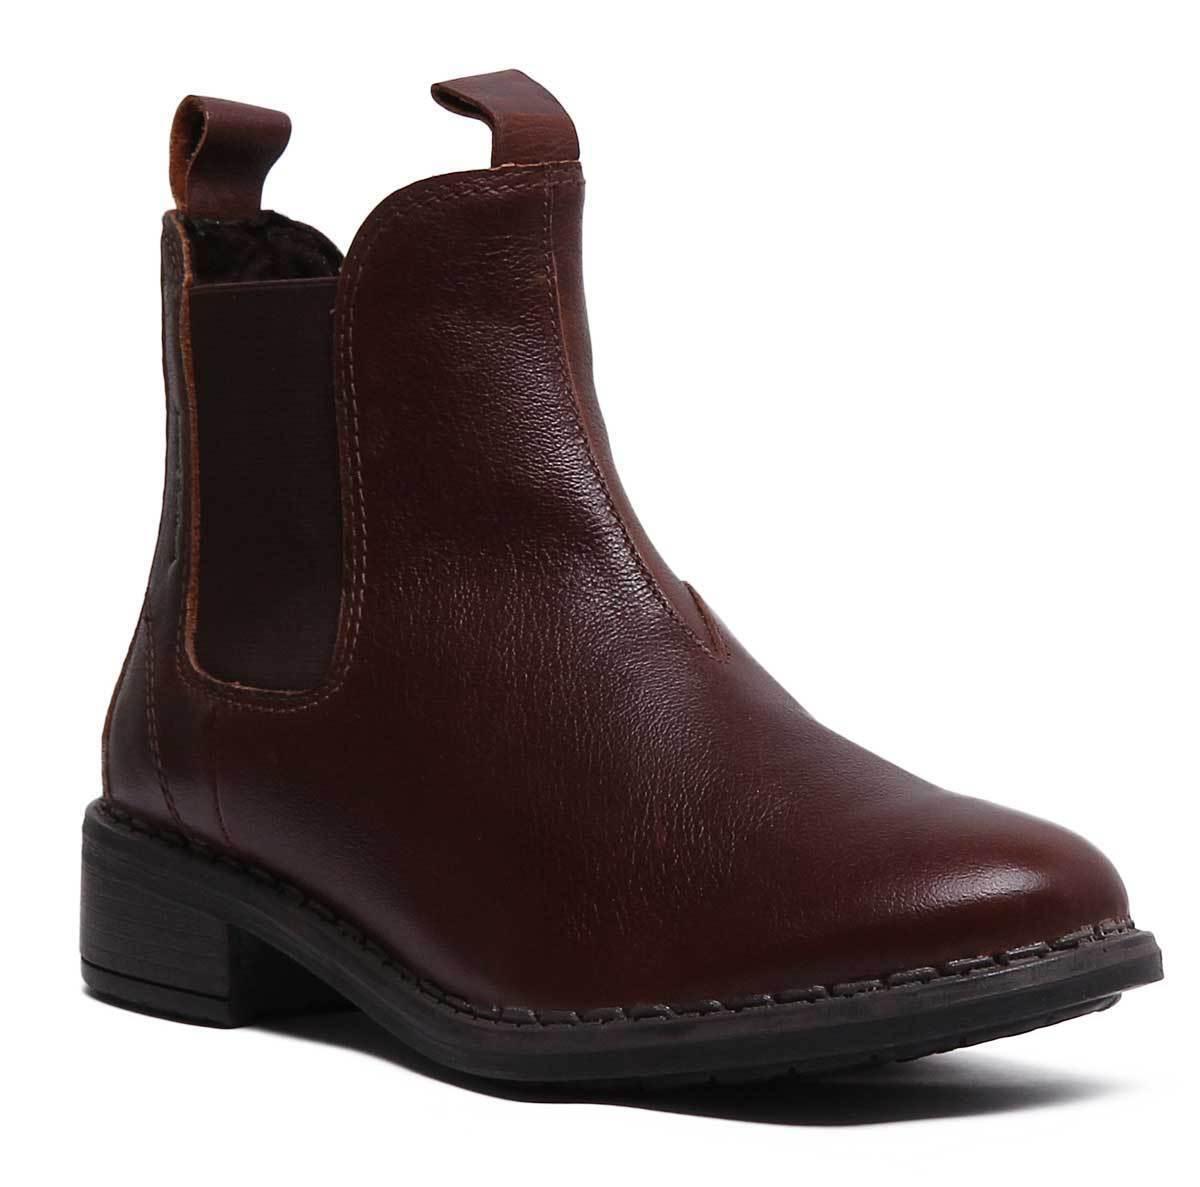 Josef Seibel Salena 11 Womens Leather Cognac Chelsea Ankle Boots Size UK 3 - 8